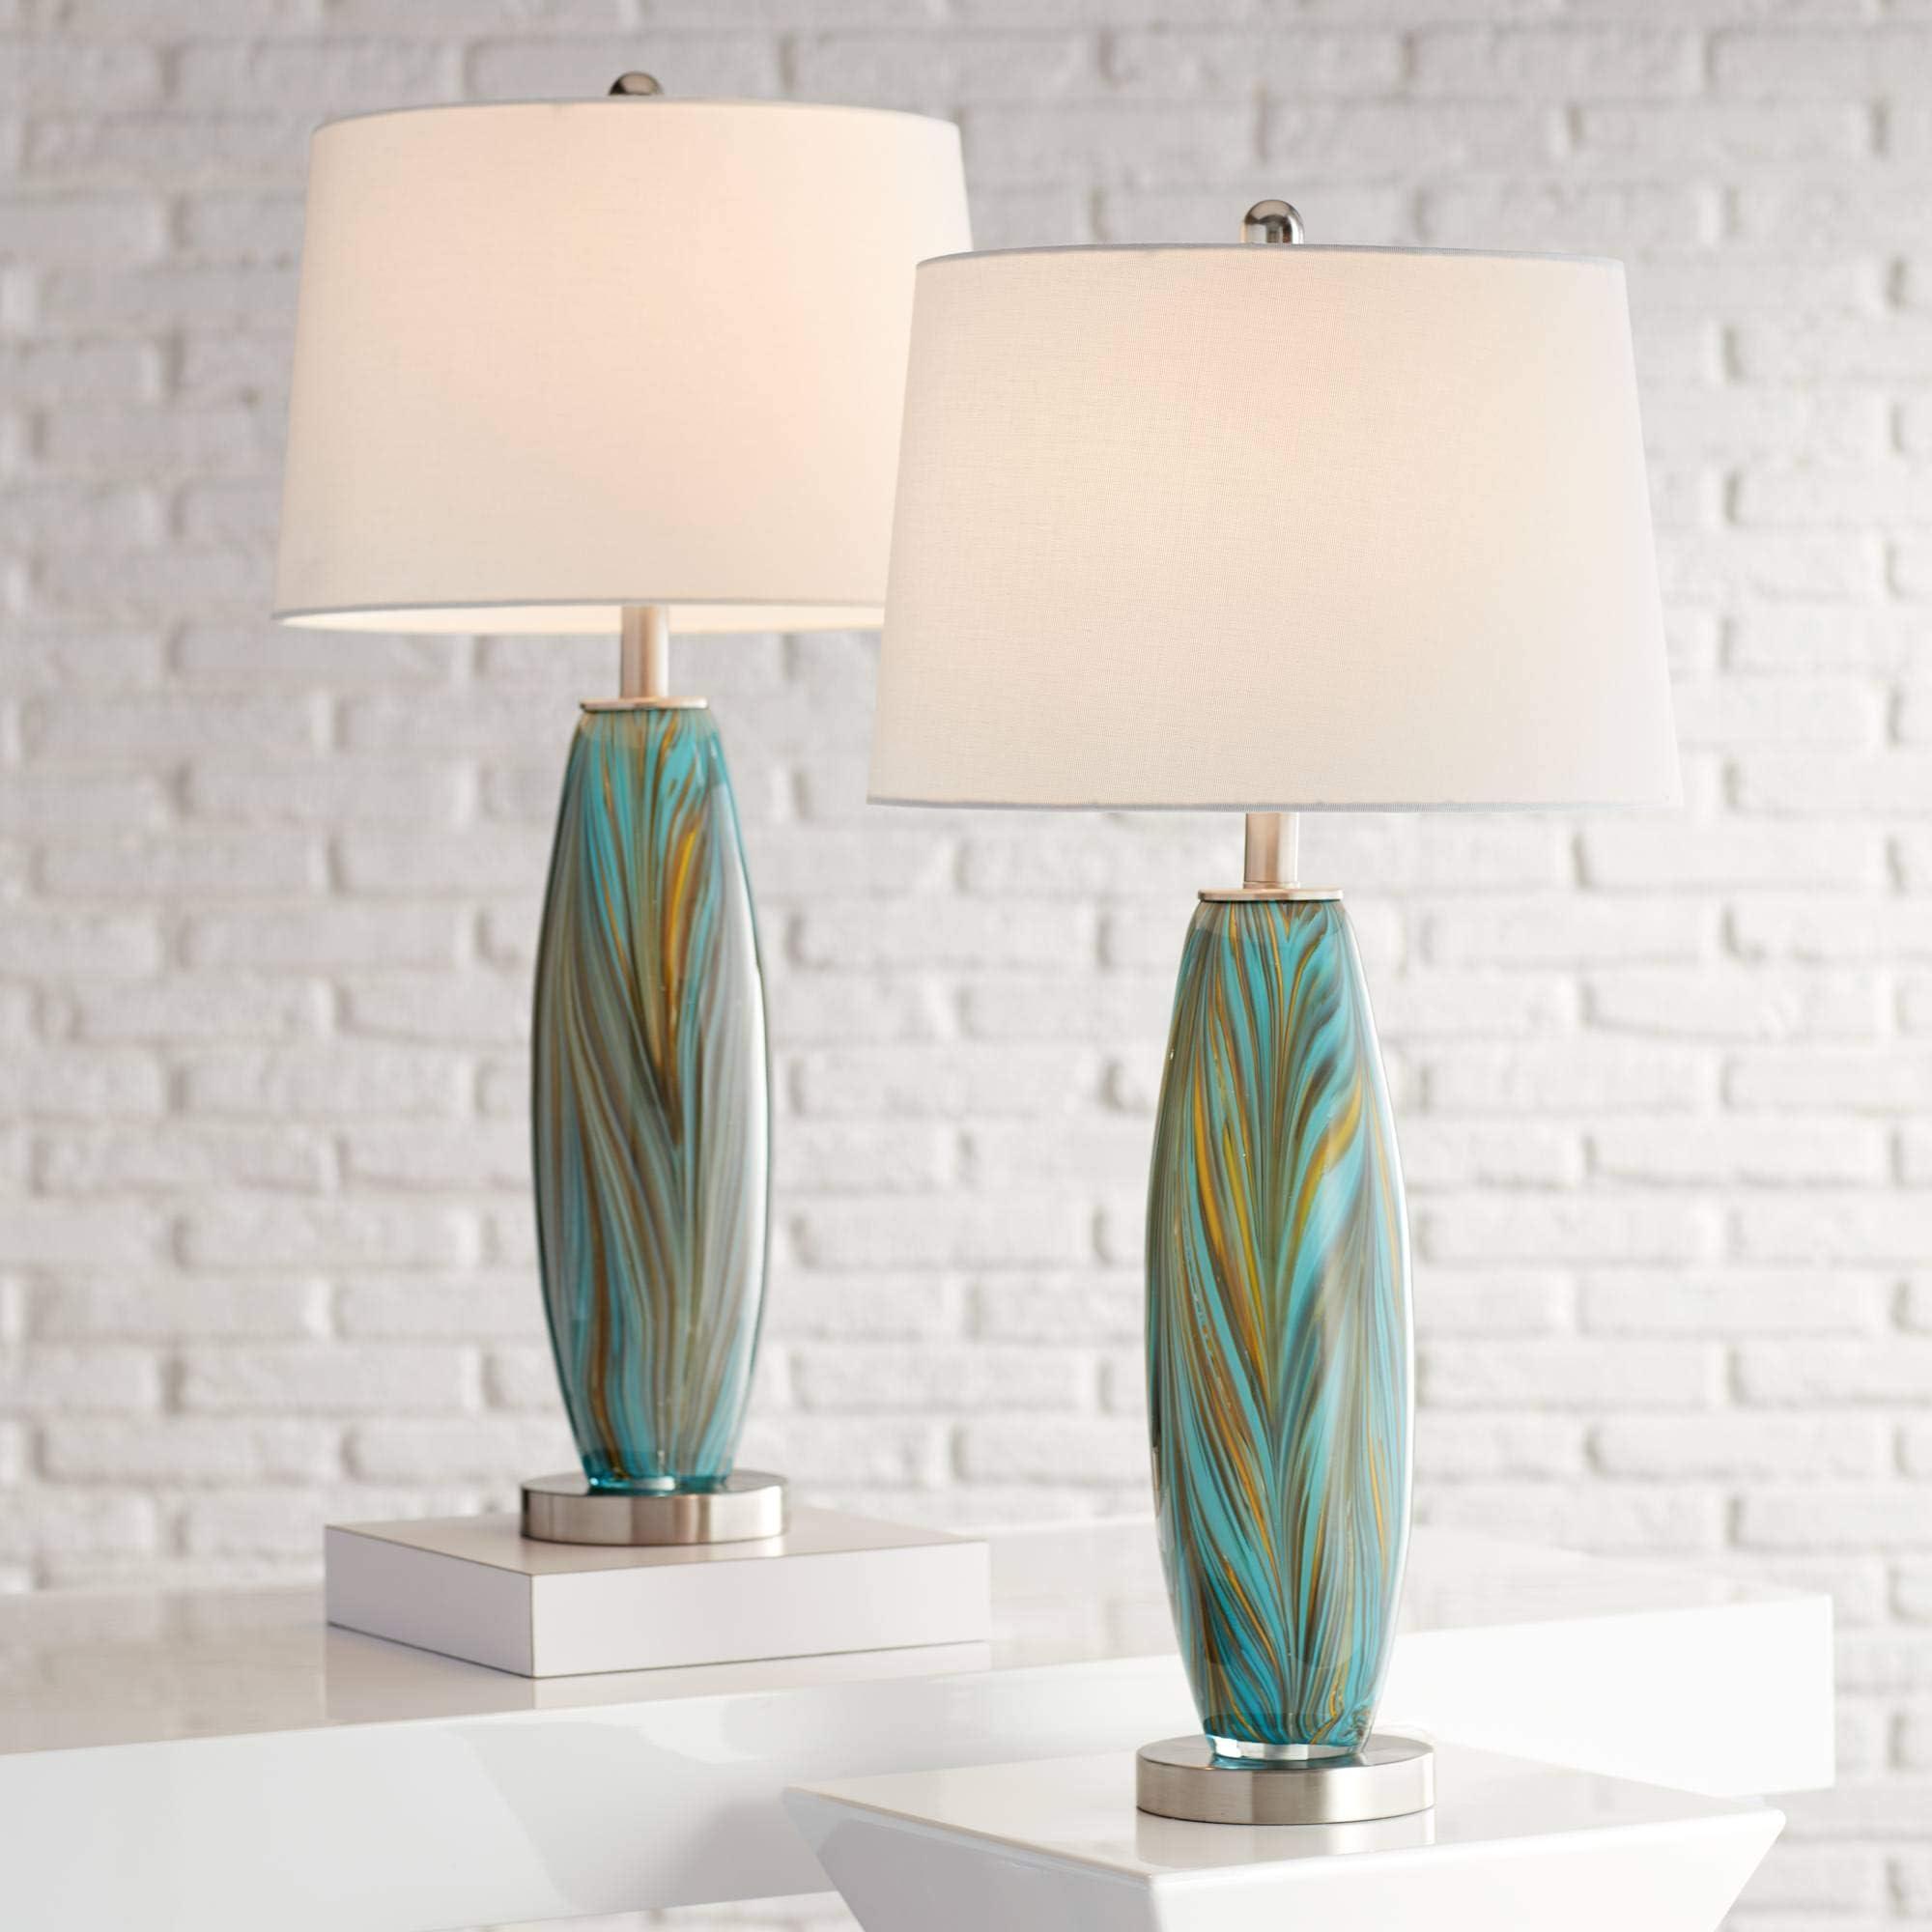 mid century TEAK /& CERAMIC lamps modern minimalist deco style mod TIKI boho lamps by Green \u00a9